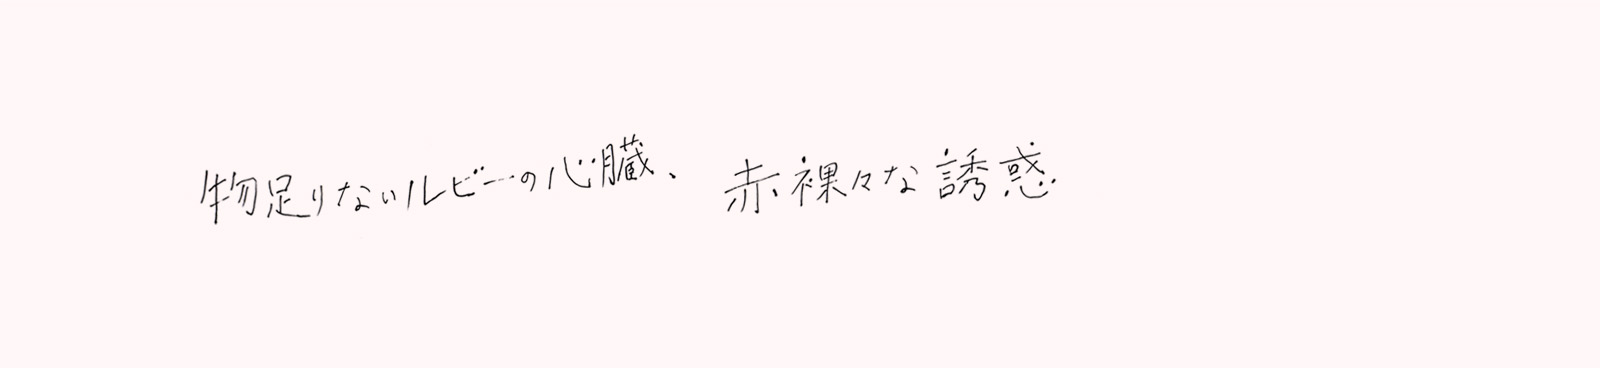 maegamimami's blog